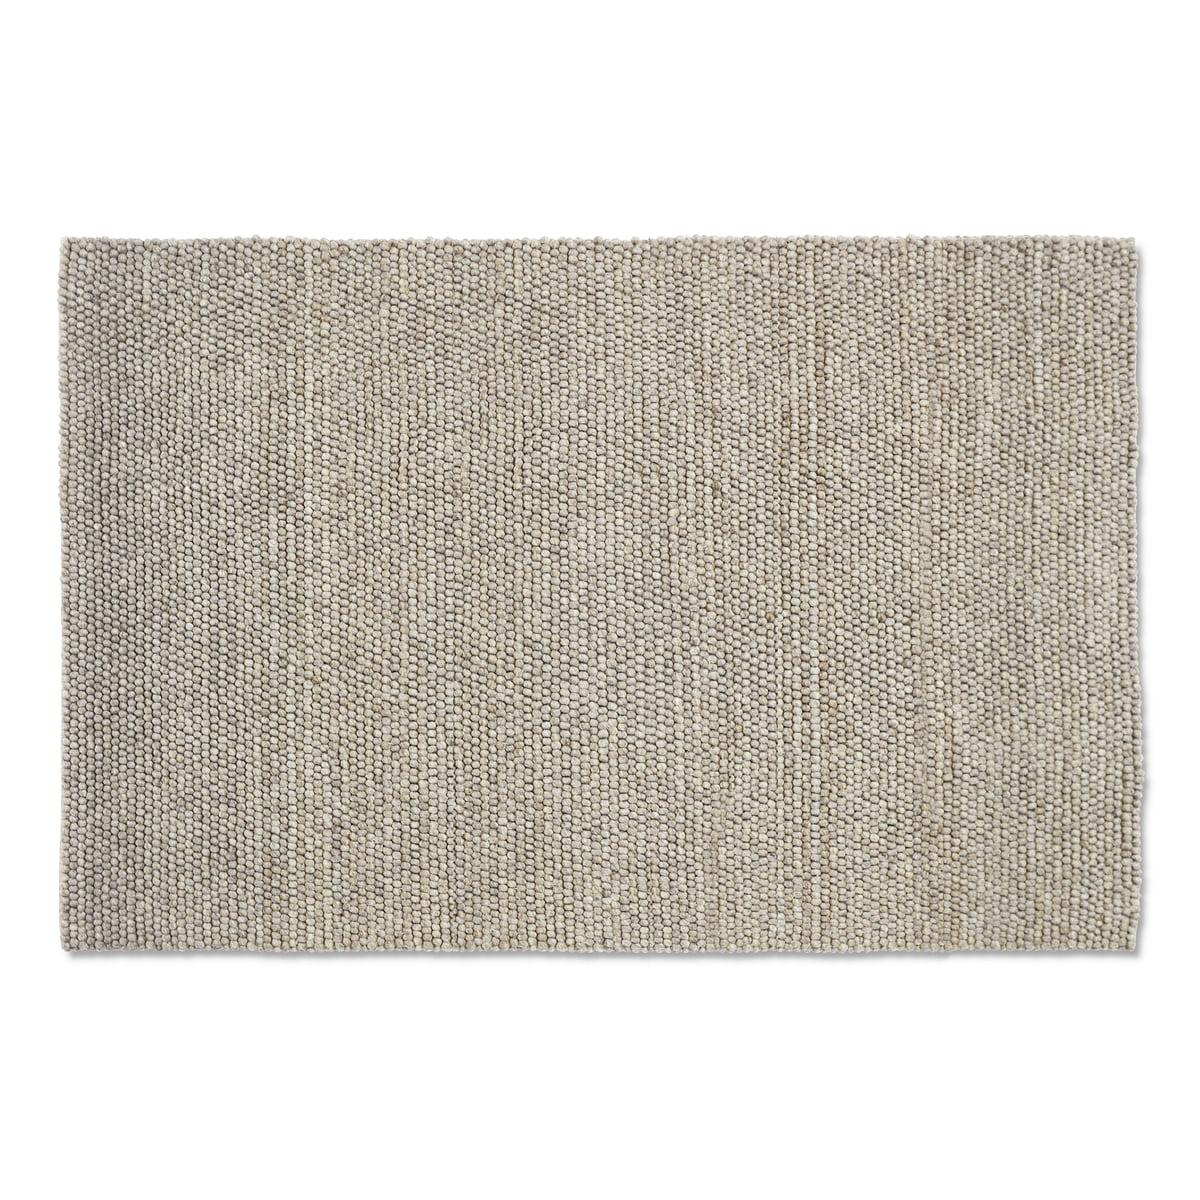 GroBartig Peas Teppich 200 X 300 Cm Von Hay In Soft Grey